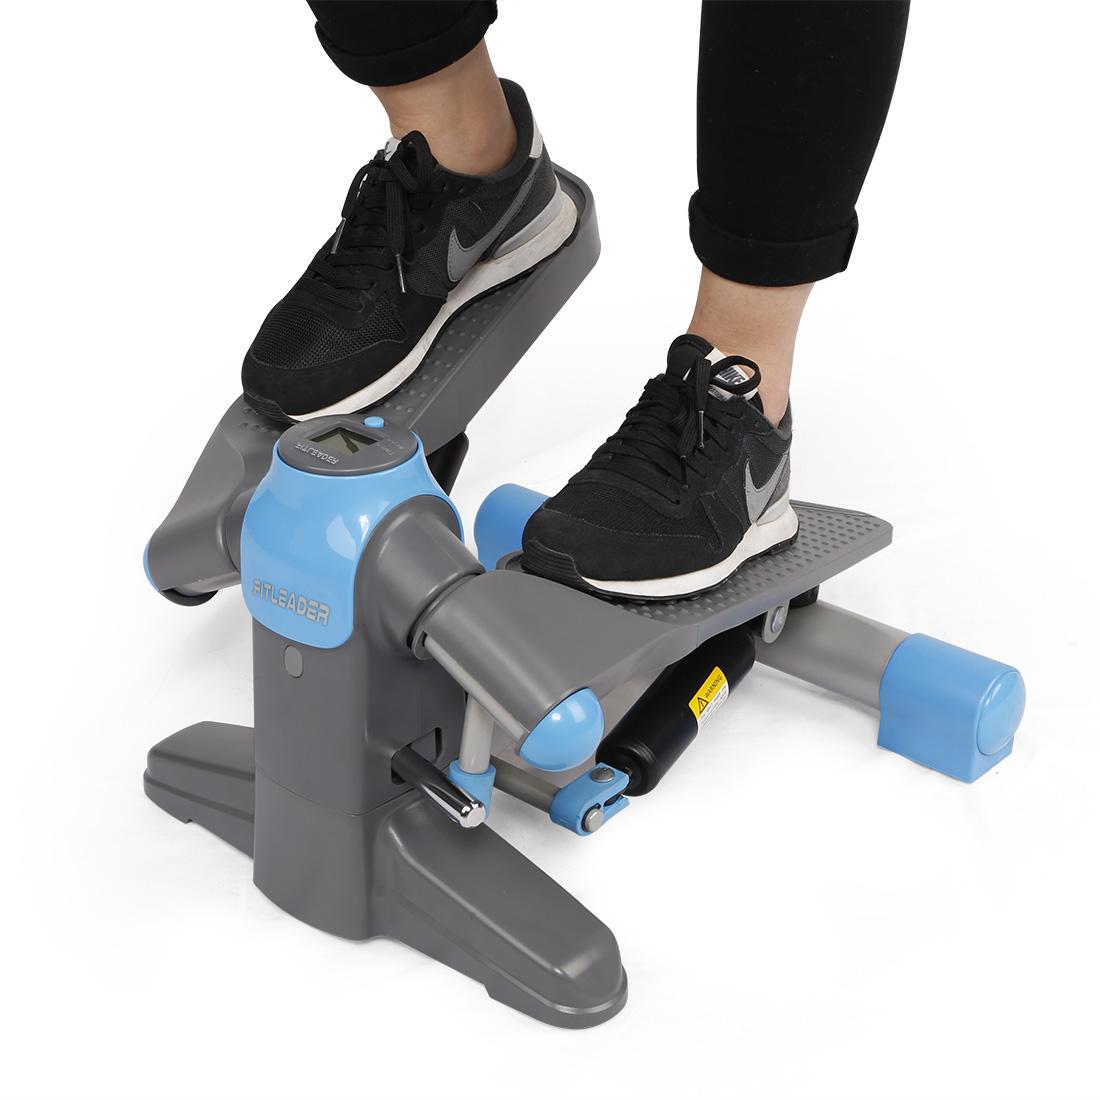 Fp1 Mini Twister Stepper Elliptical Trainer Machine Pedal Exerciser Com